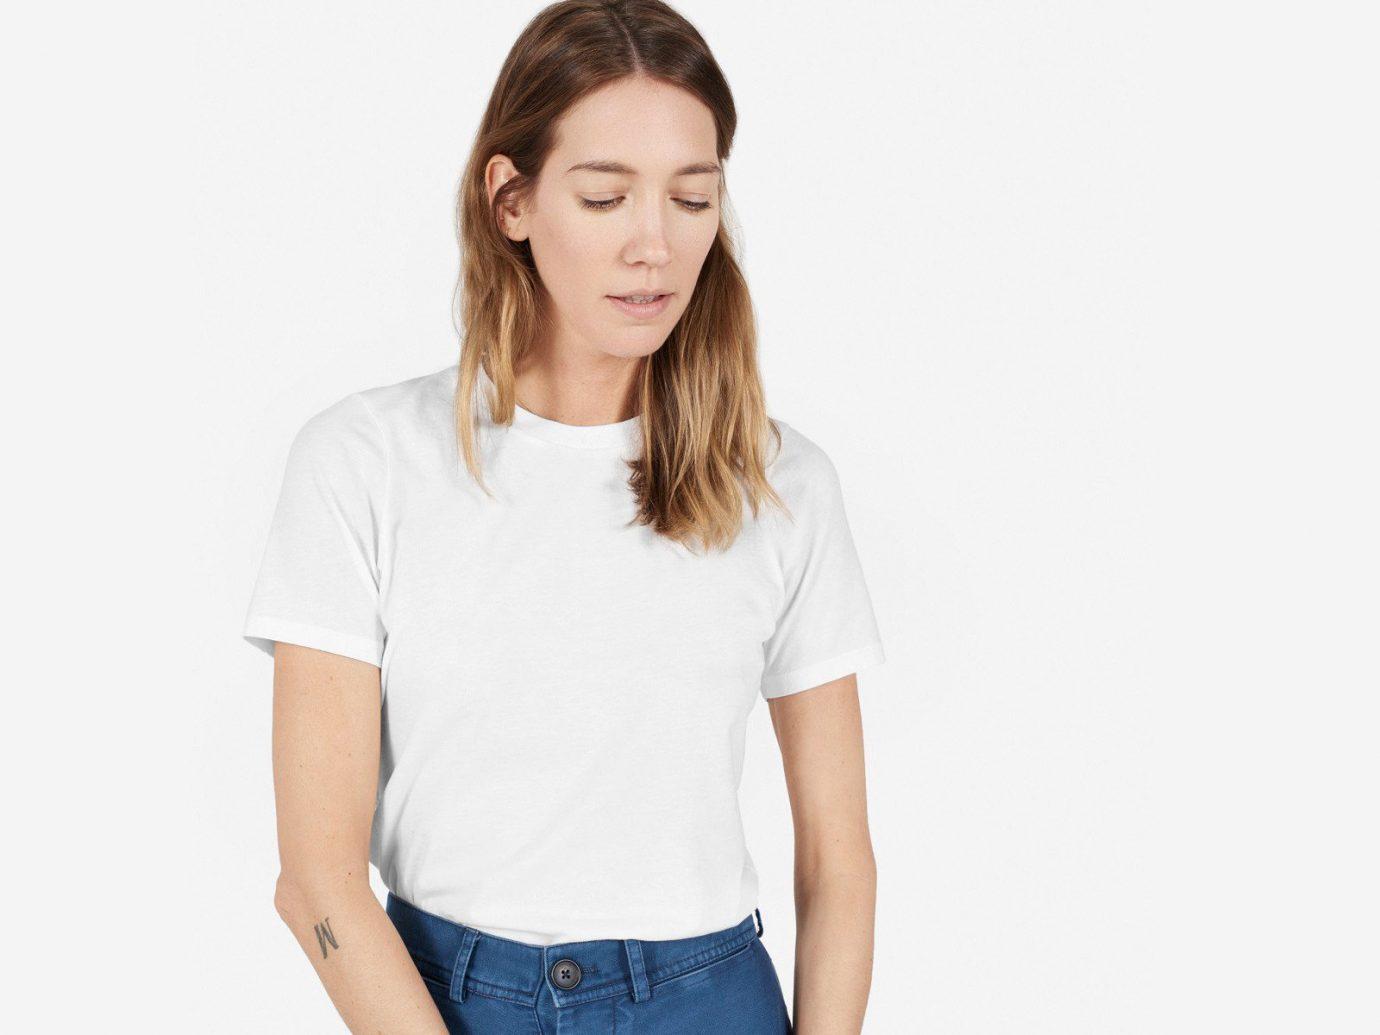 Style + Design person t shirt white clothing sleeve standing pocket arm neck photo shoot shirt blouse human body posing